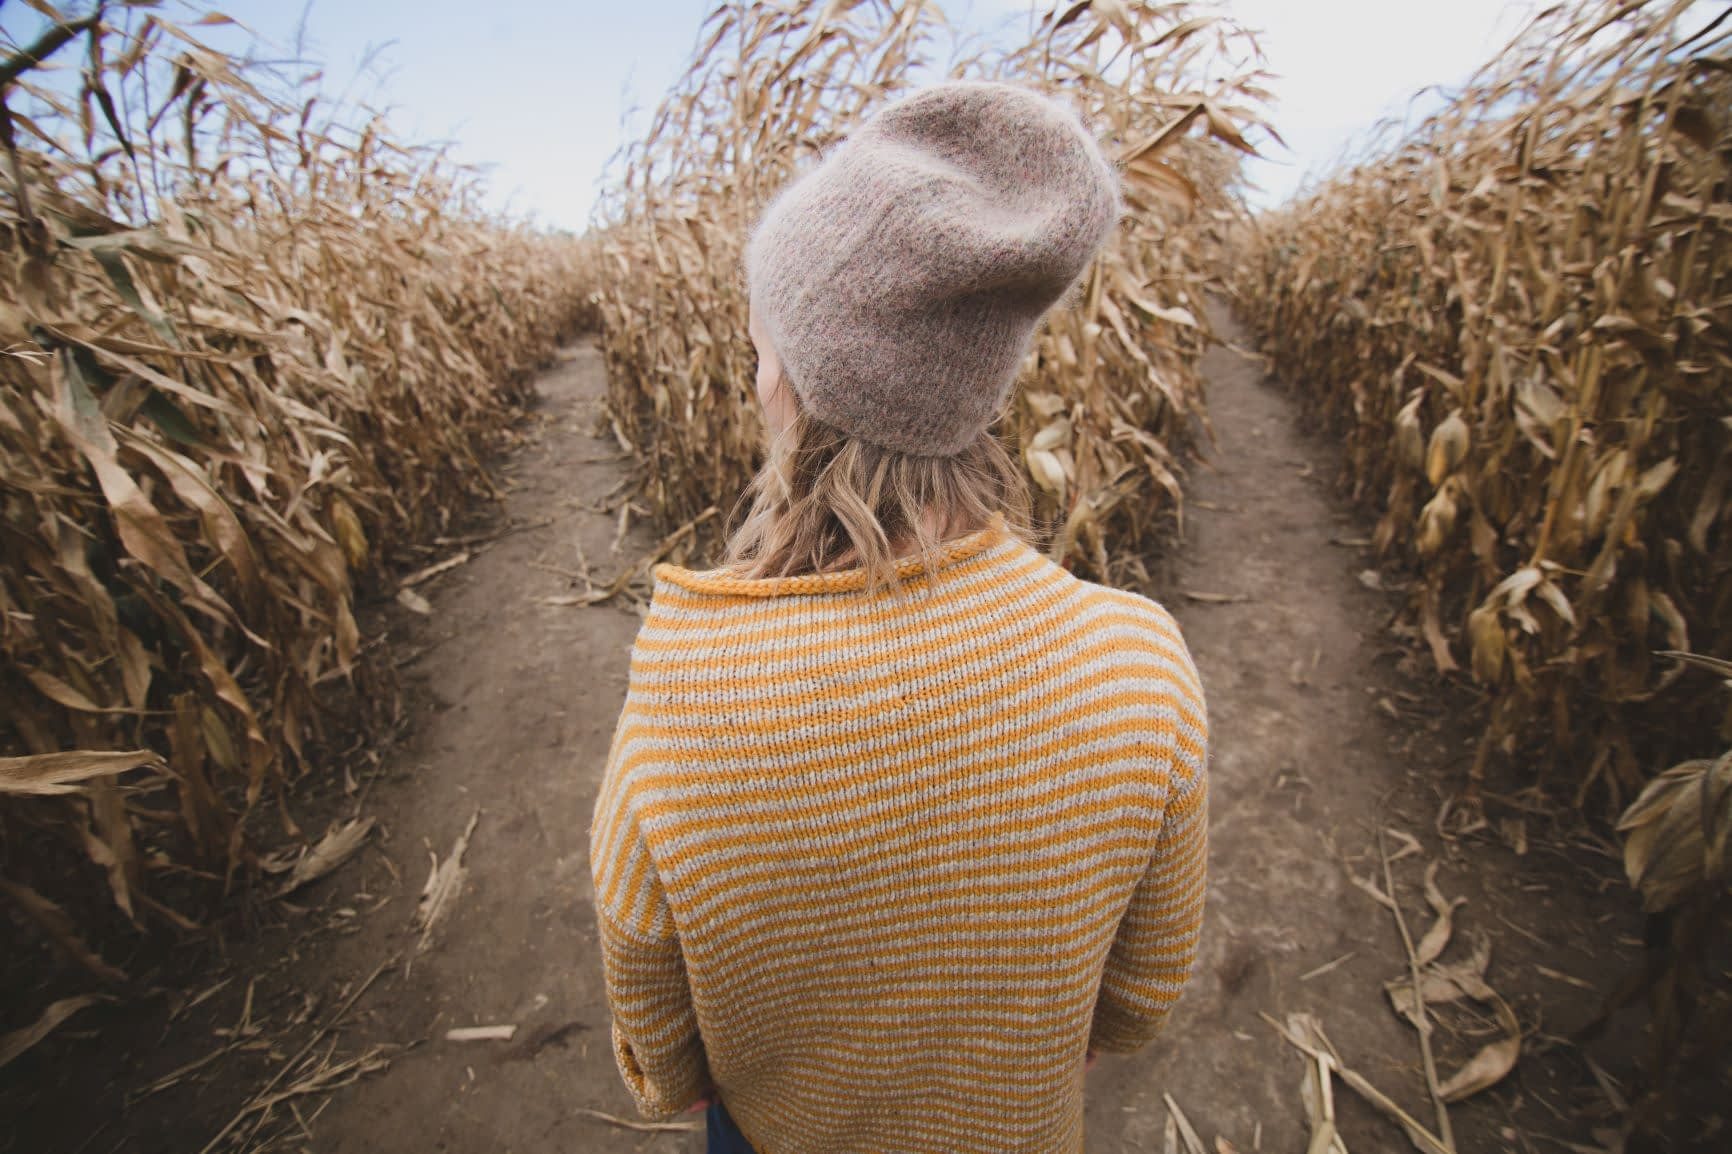 Woman standing between two roads in field of wheat